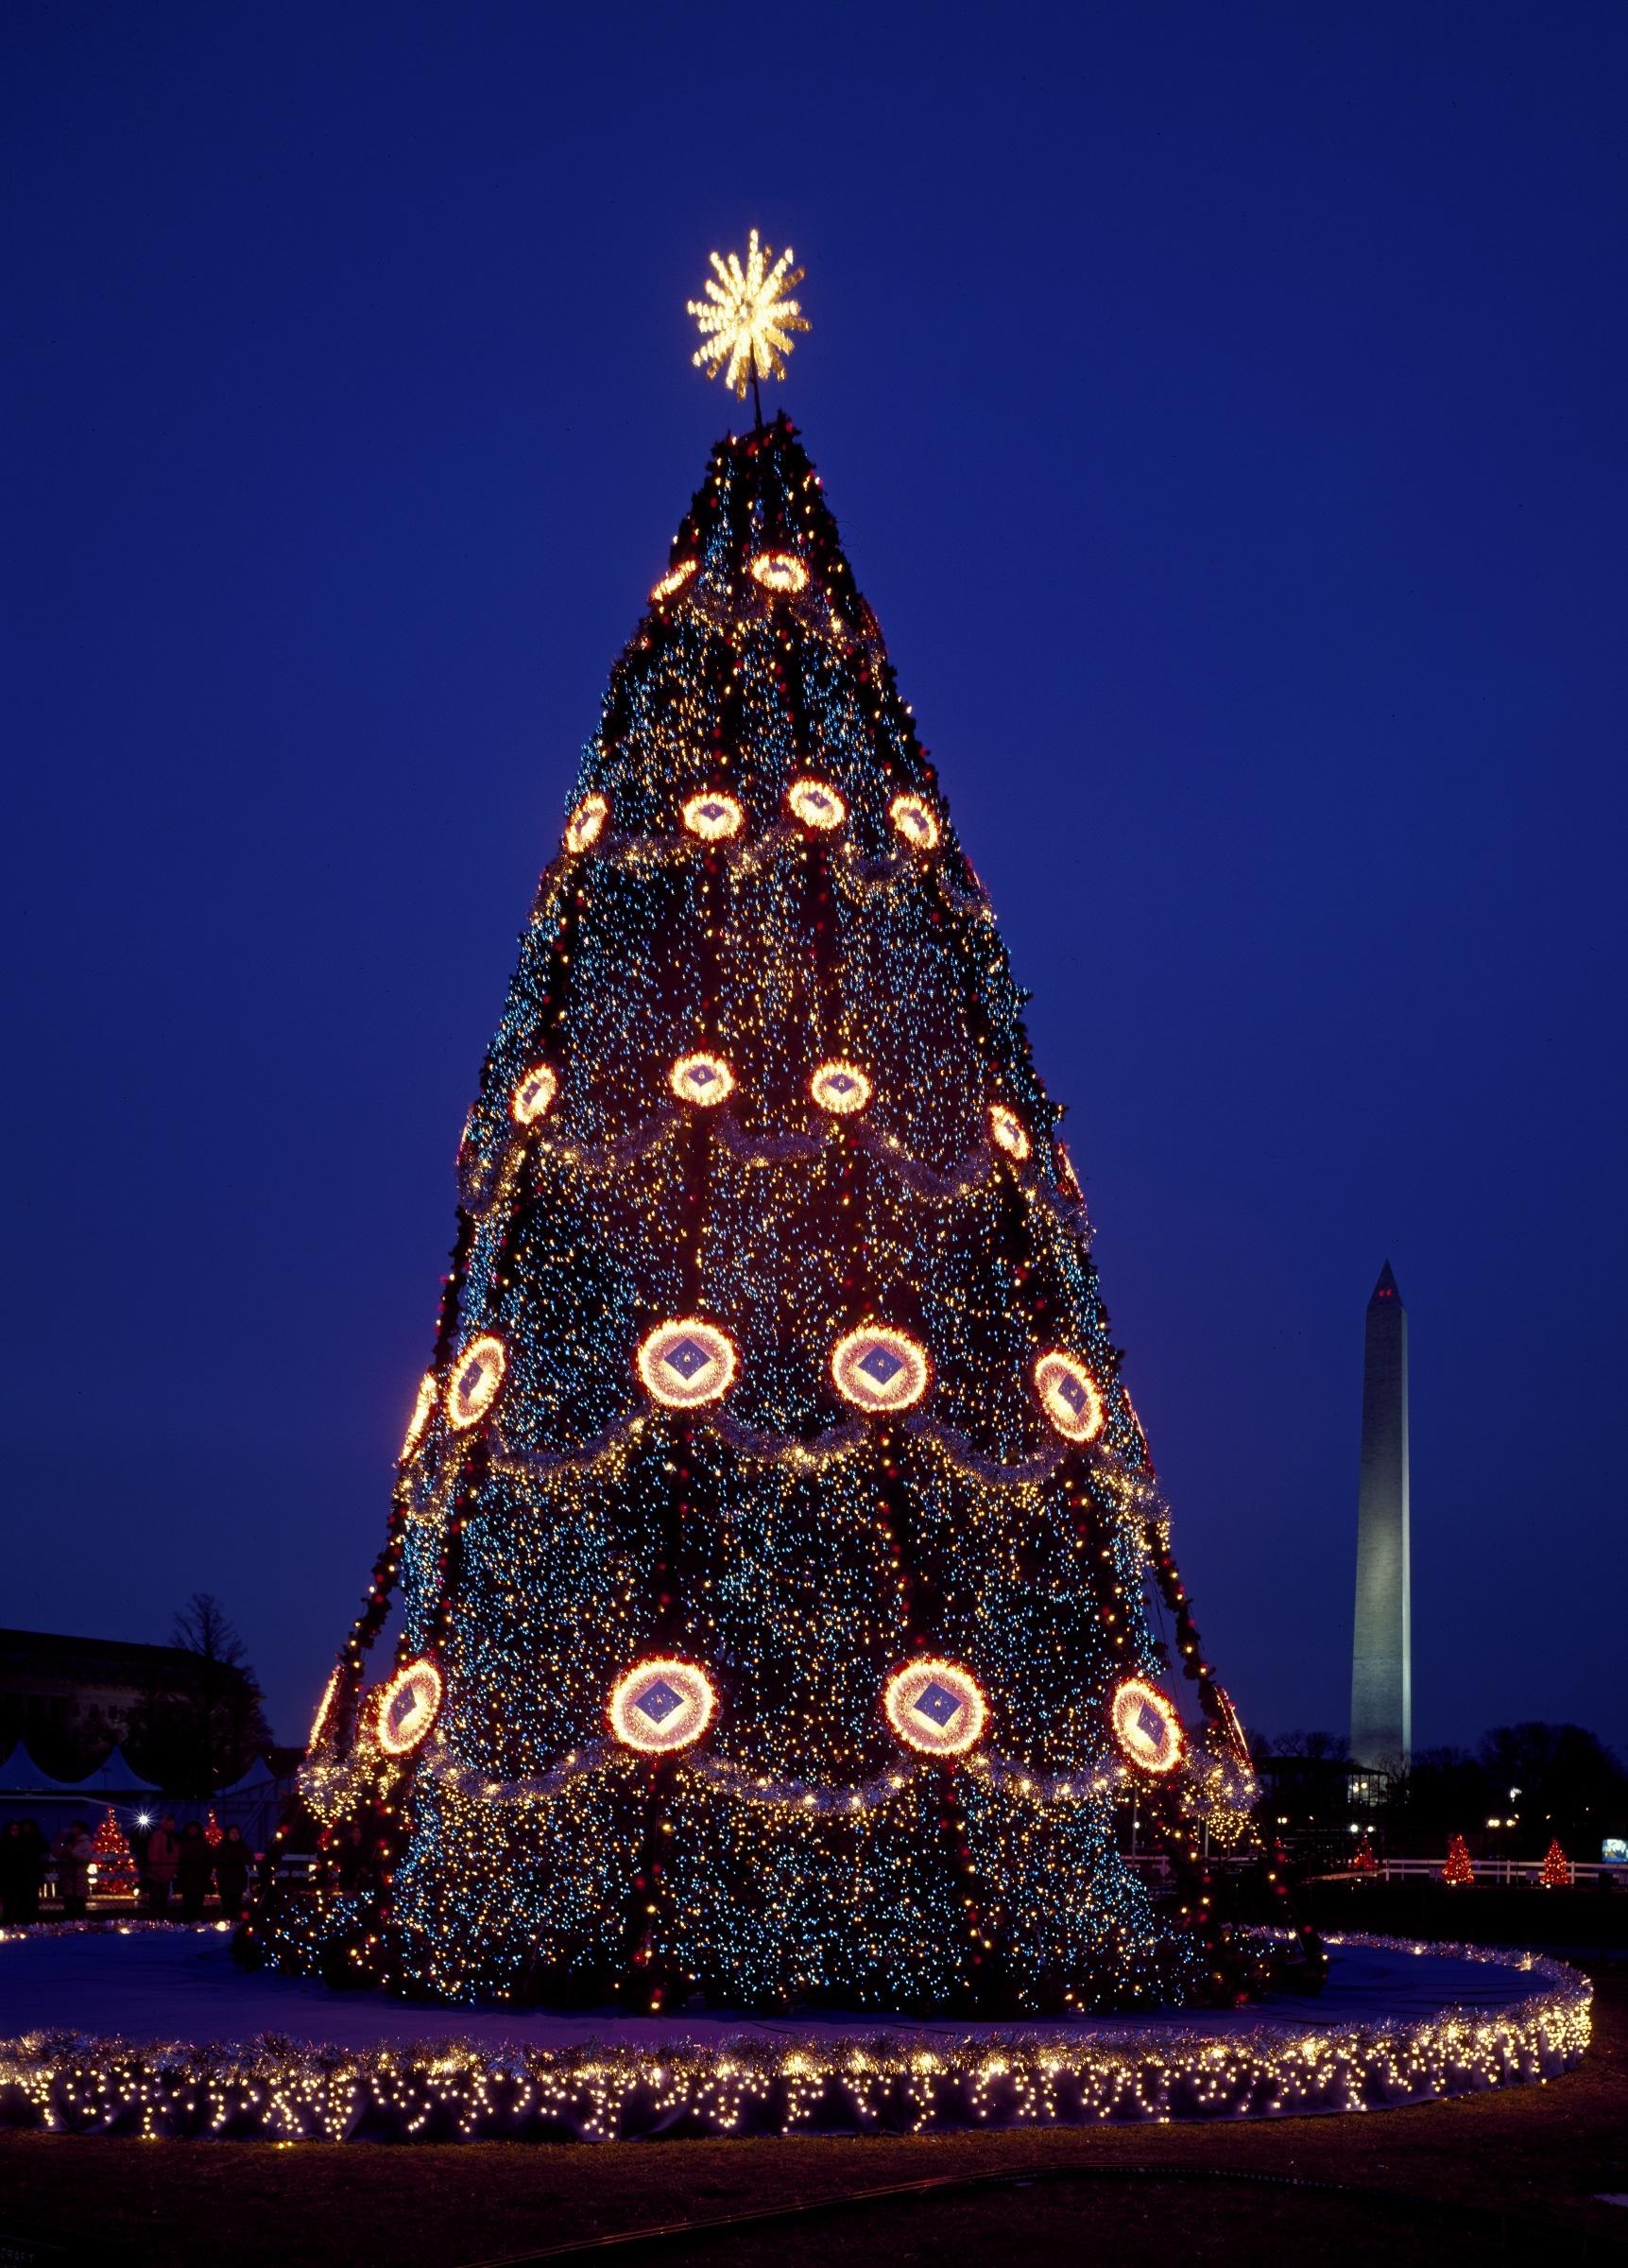 Tree Night Star Evening Tower Evergreen Holiday Landmark Christmas Festive Washington Decoration Lights